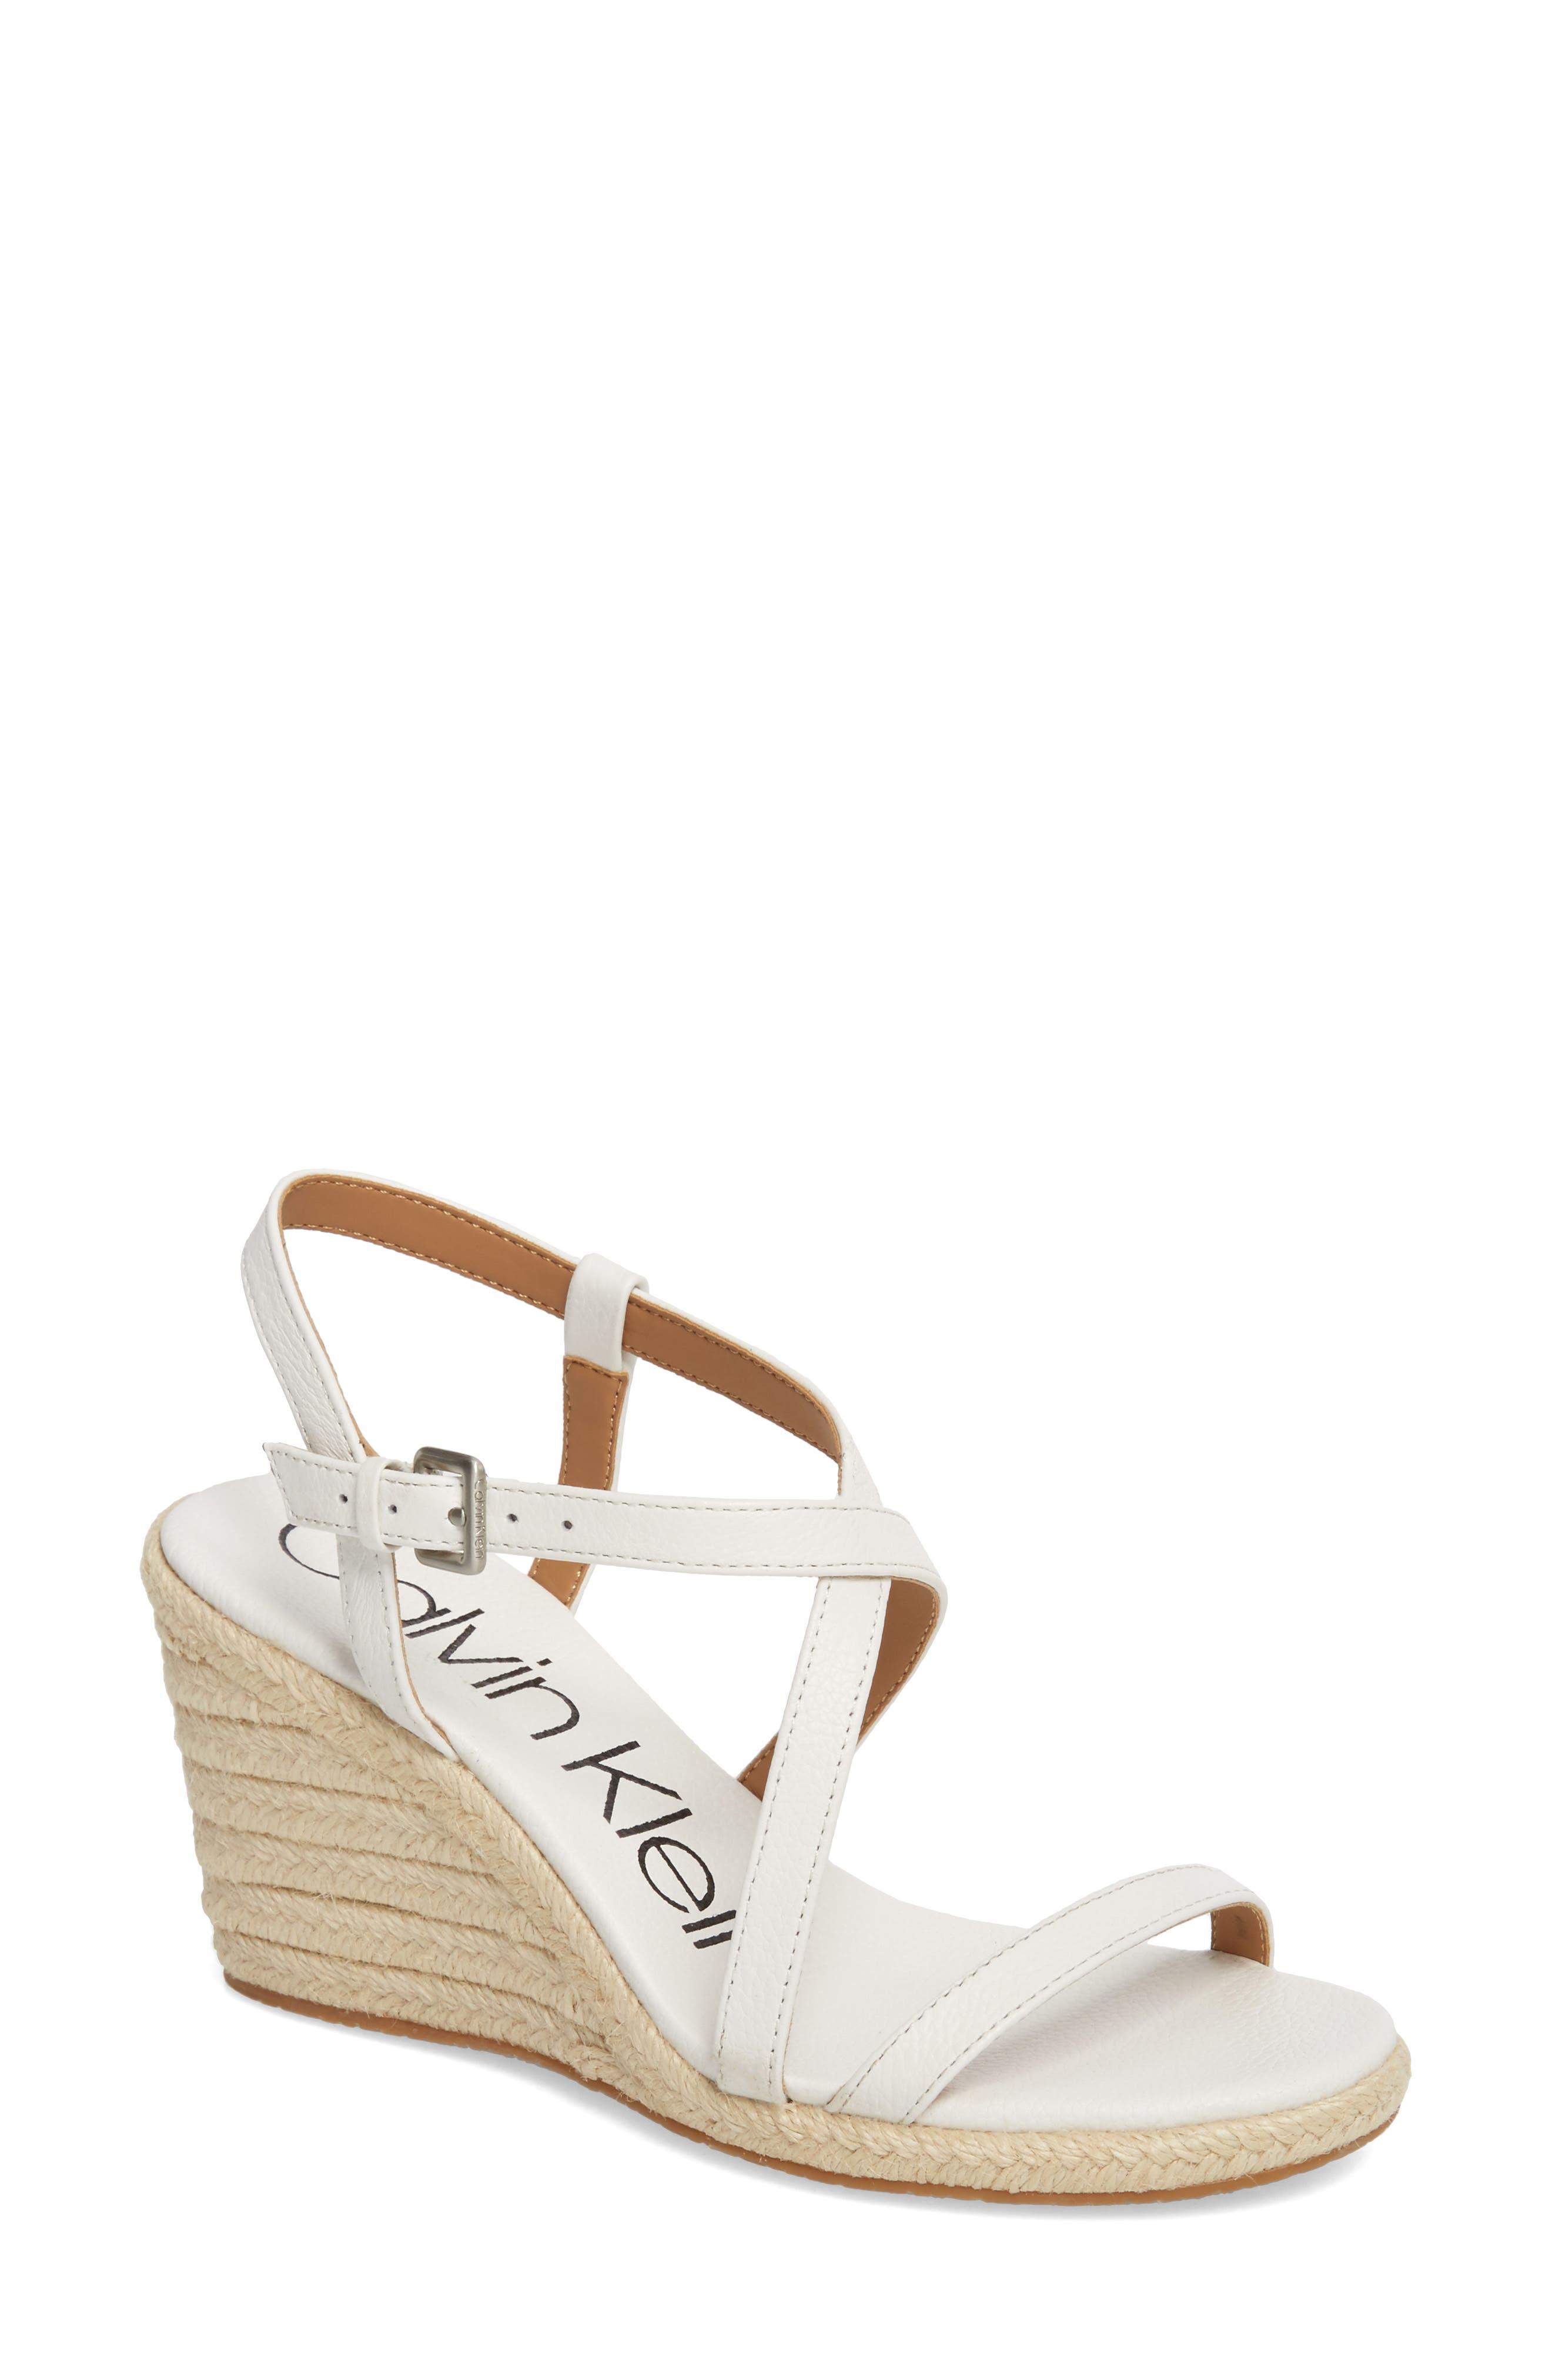 Calvin Klein Bellemine Espadrille Wedge Sandal, White